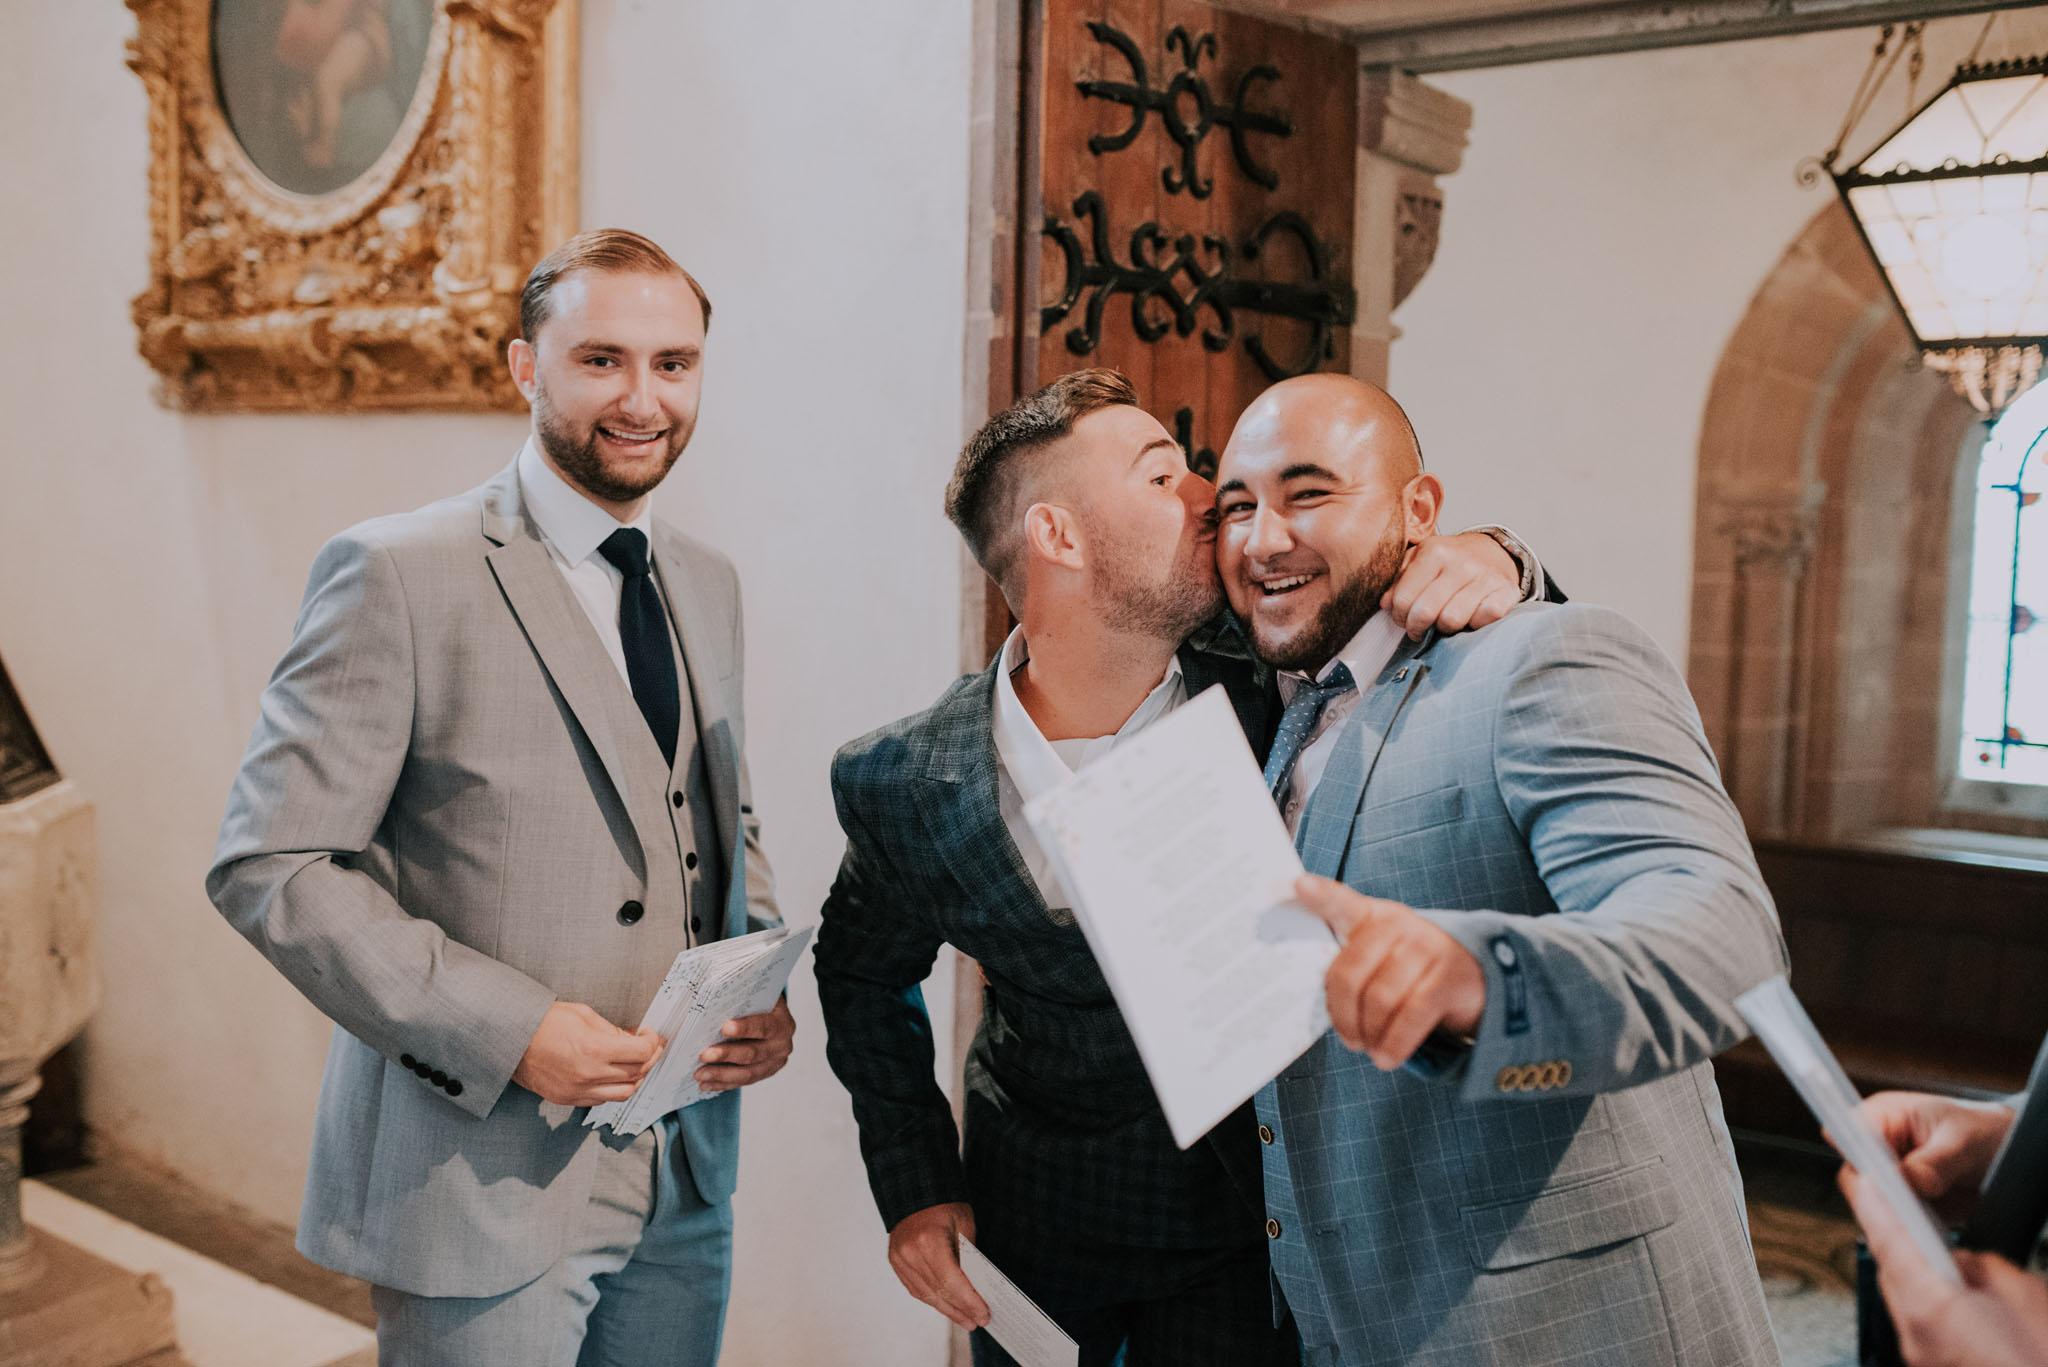 wedding-photographer-glewstone-court-hereford-scott-stockwell-photography108.jpg